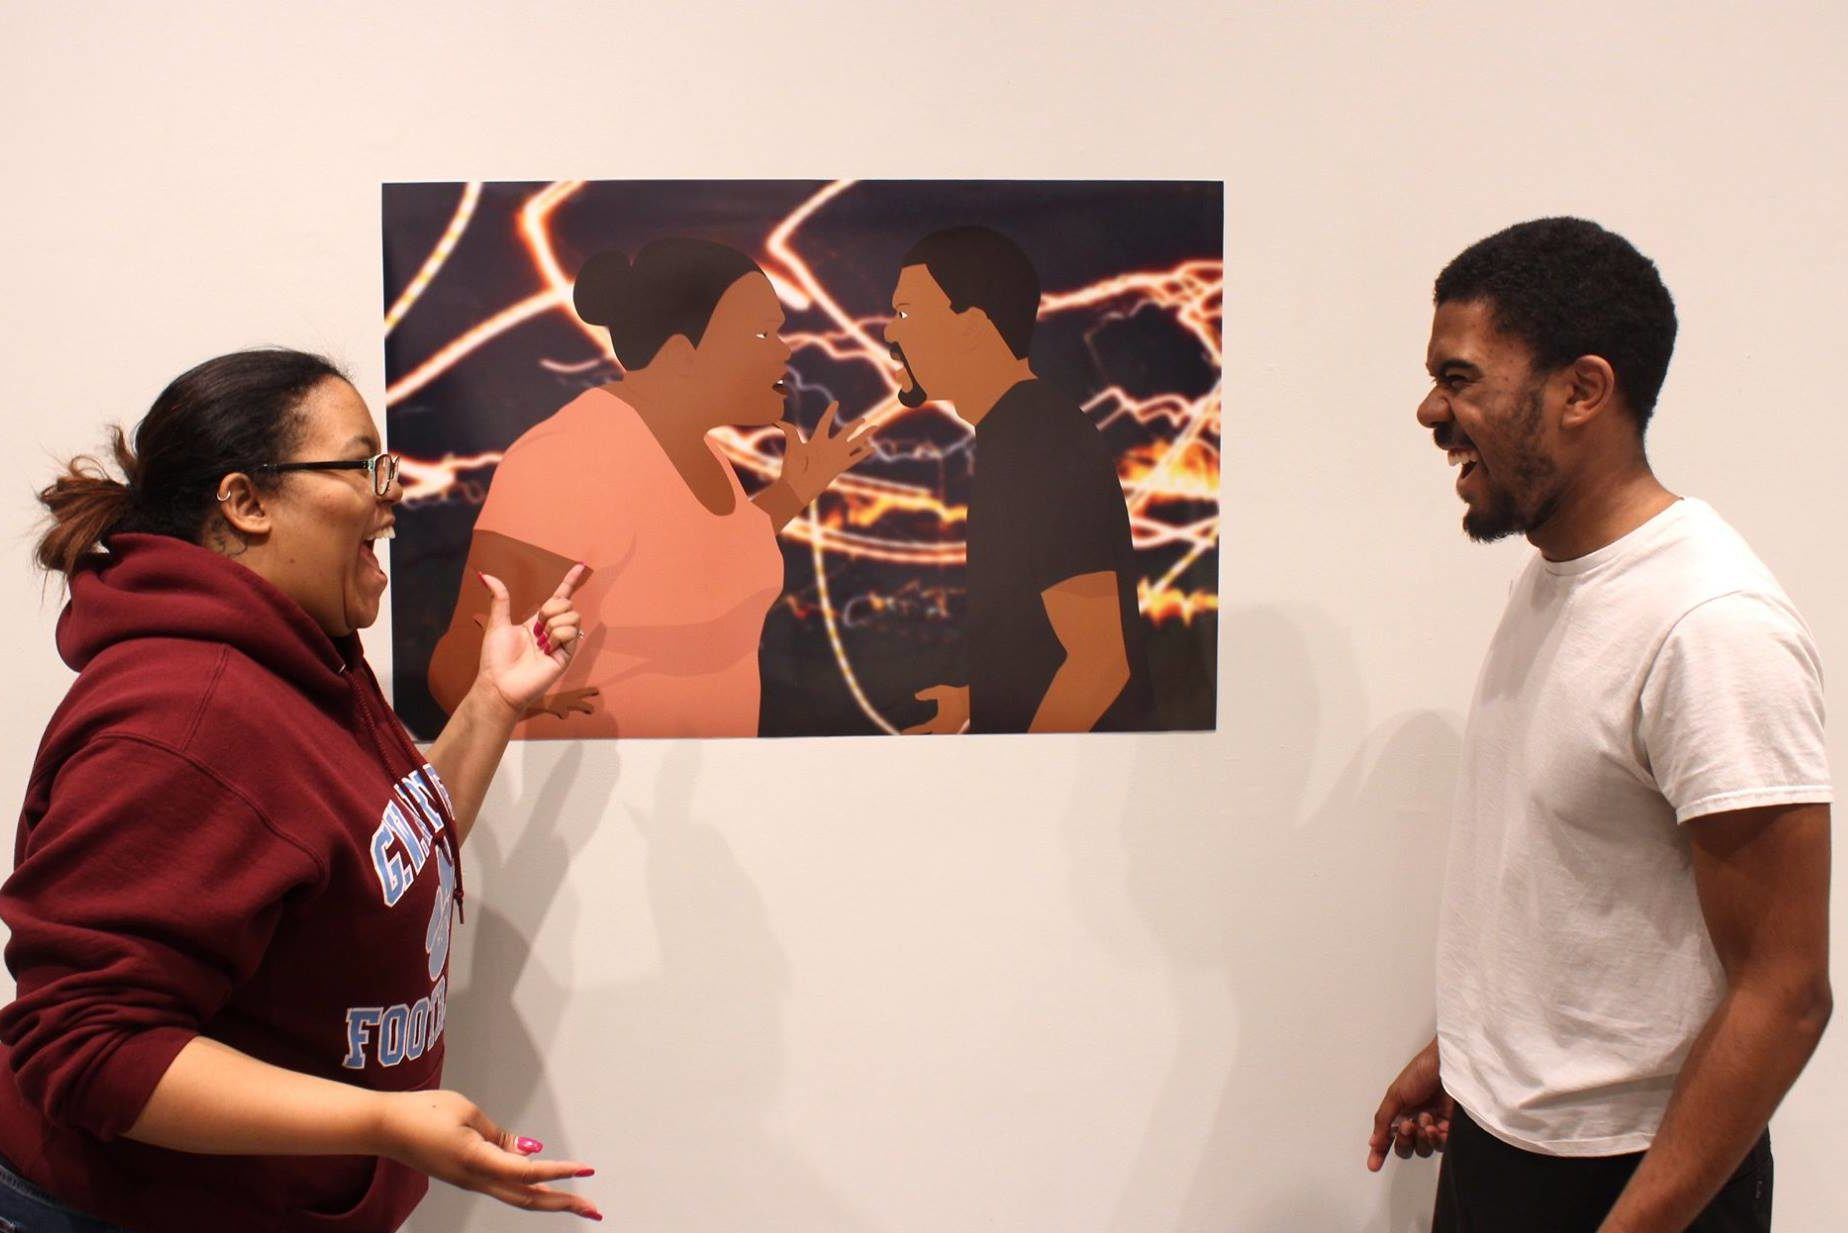 Justin Judell Davis - Senior Exhibition